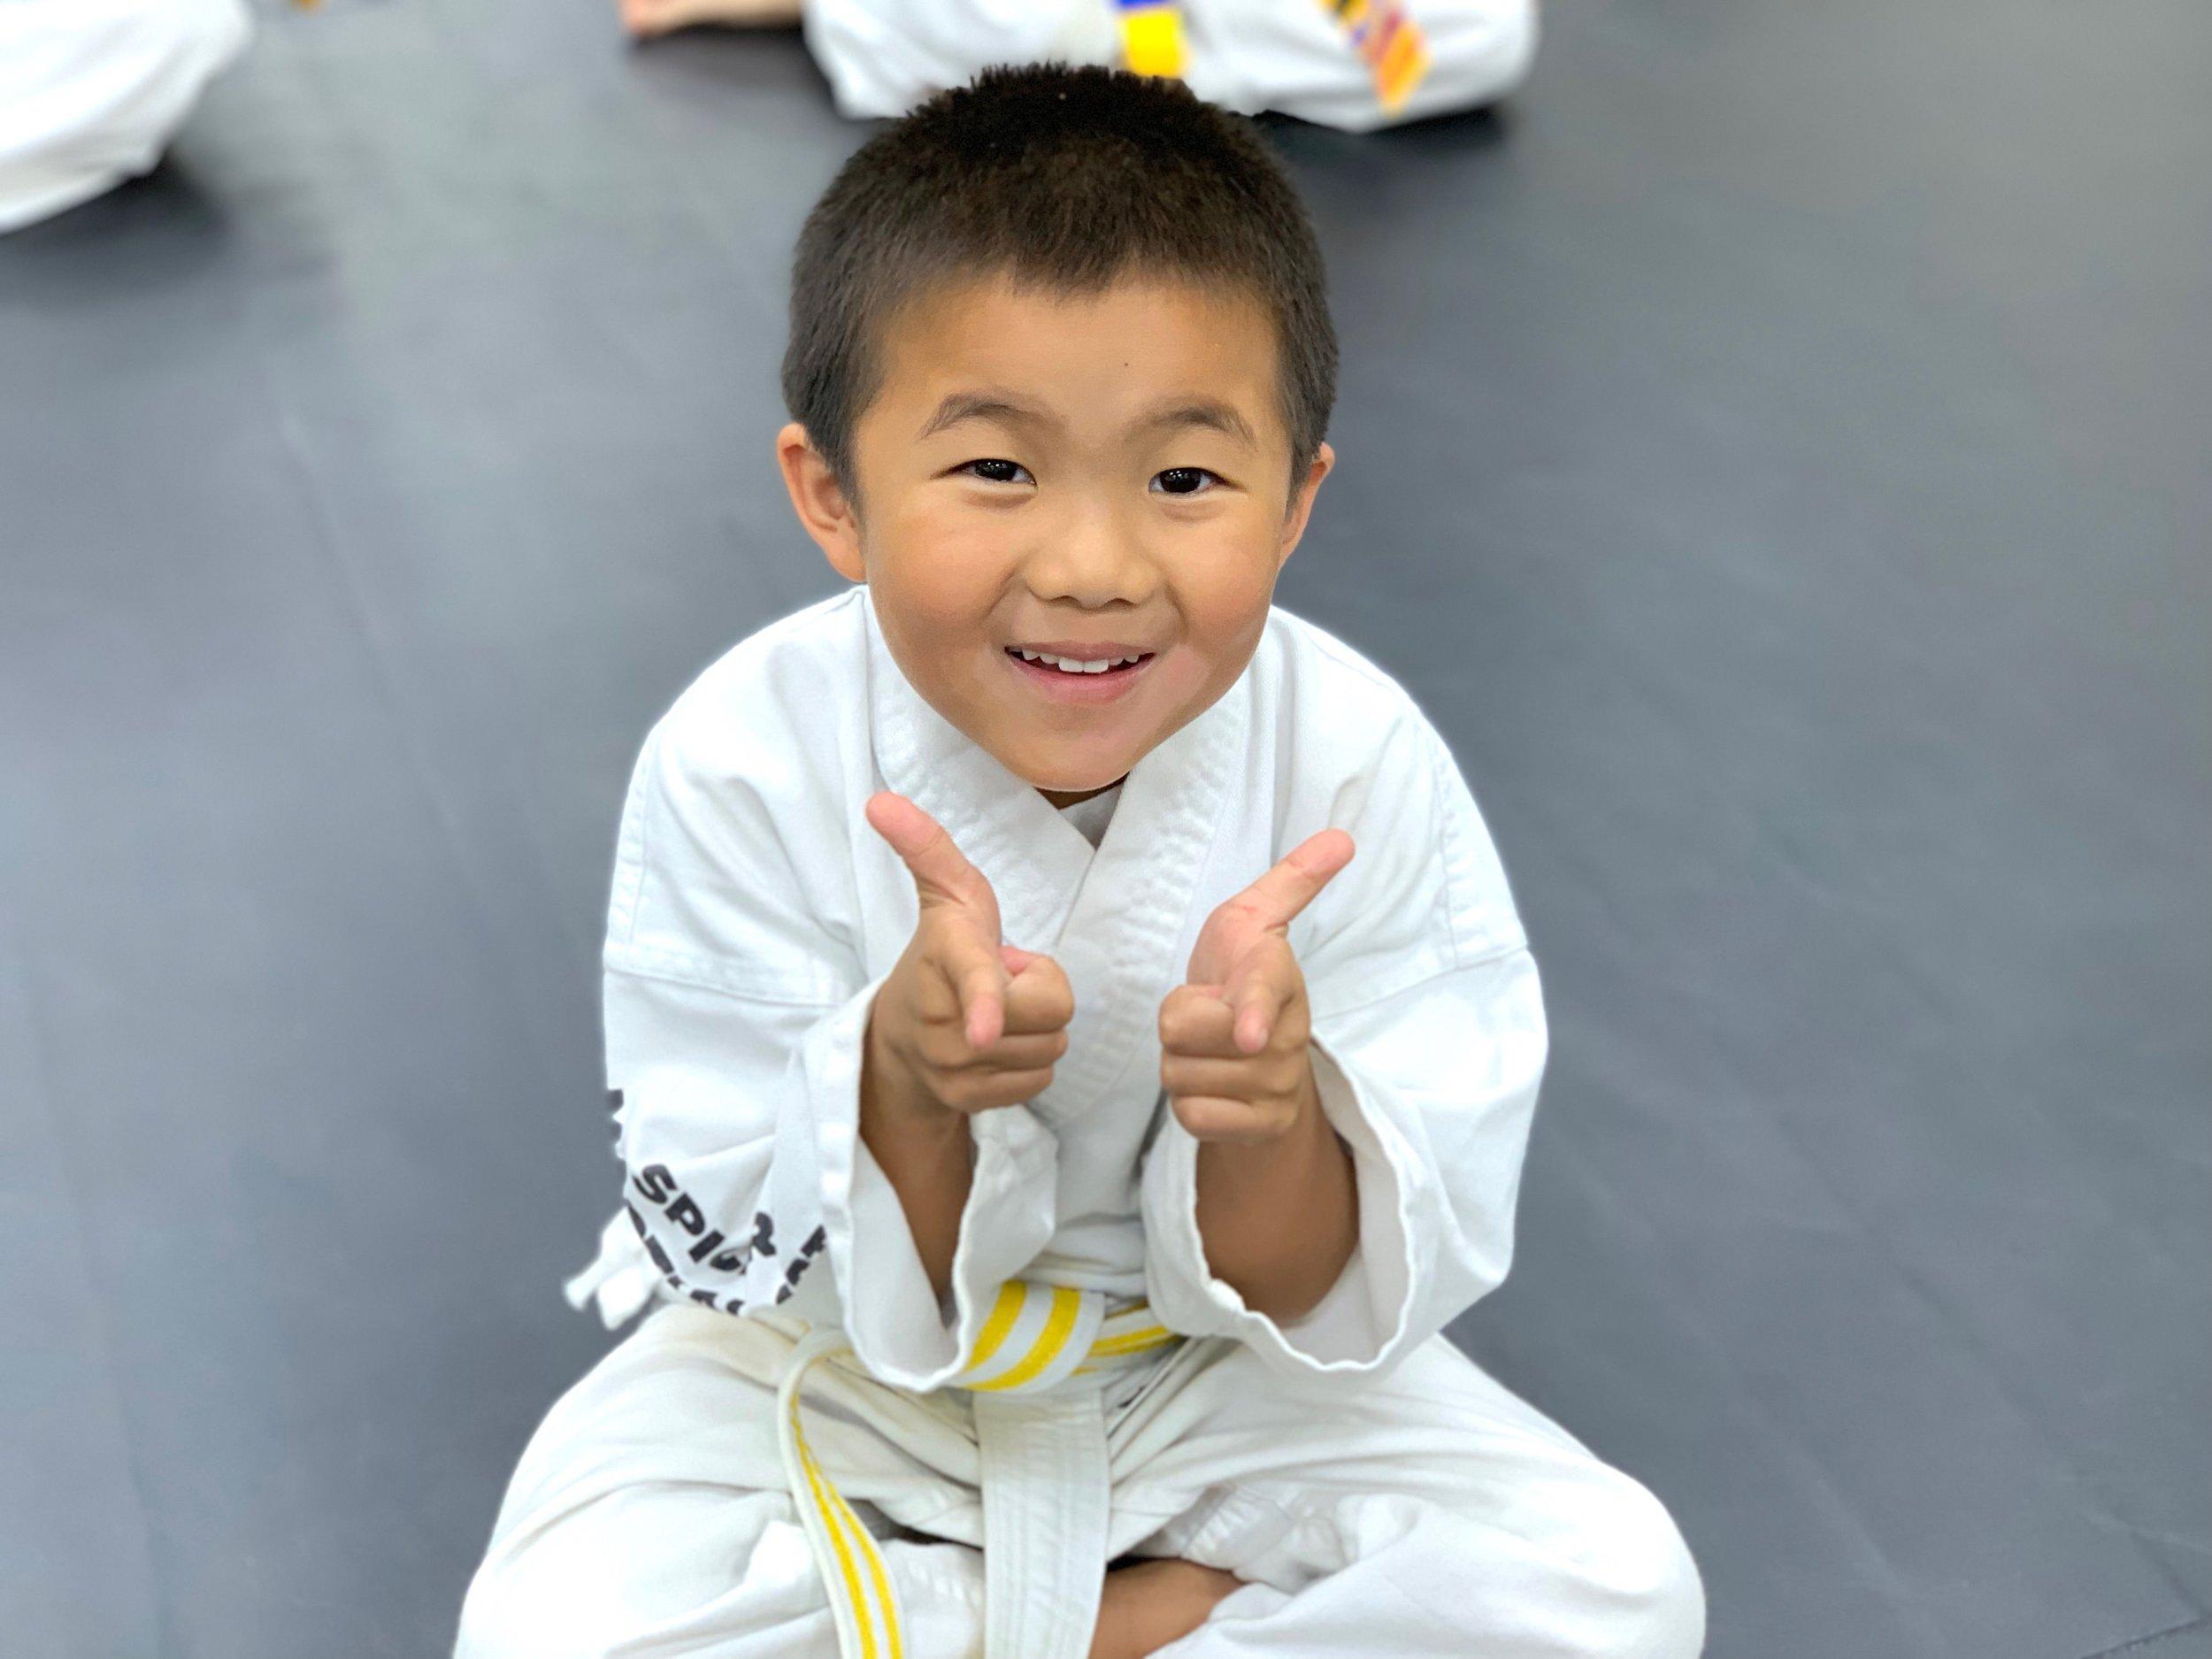 karate-kids-program-souhtlake-keller-grapevine-texas00054.jpeg